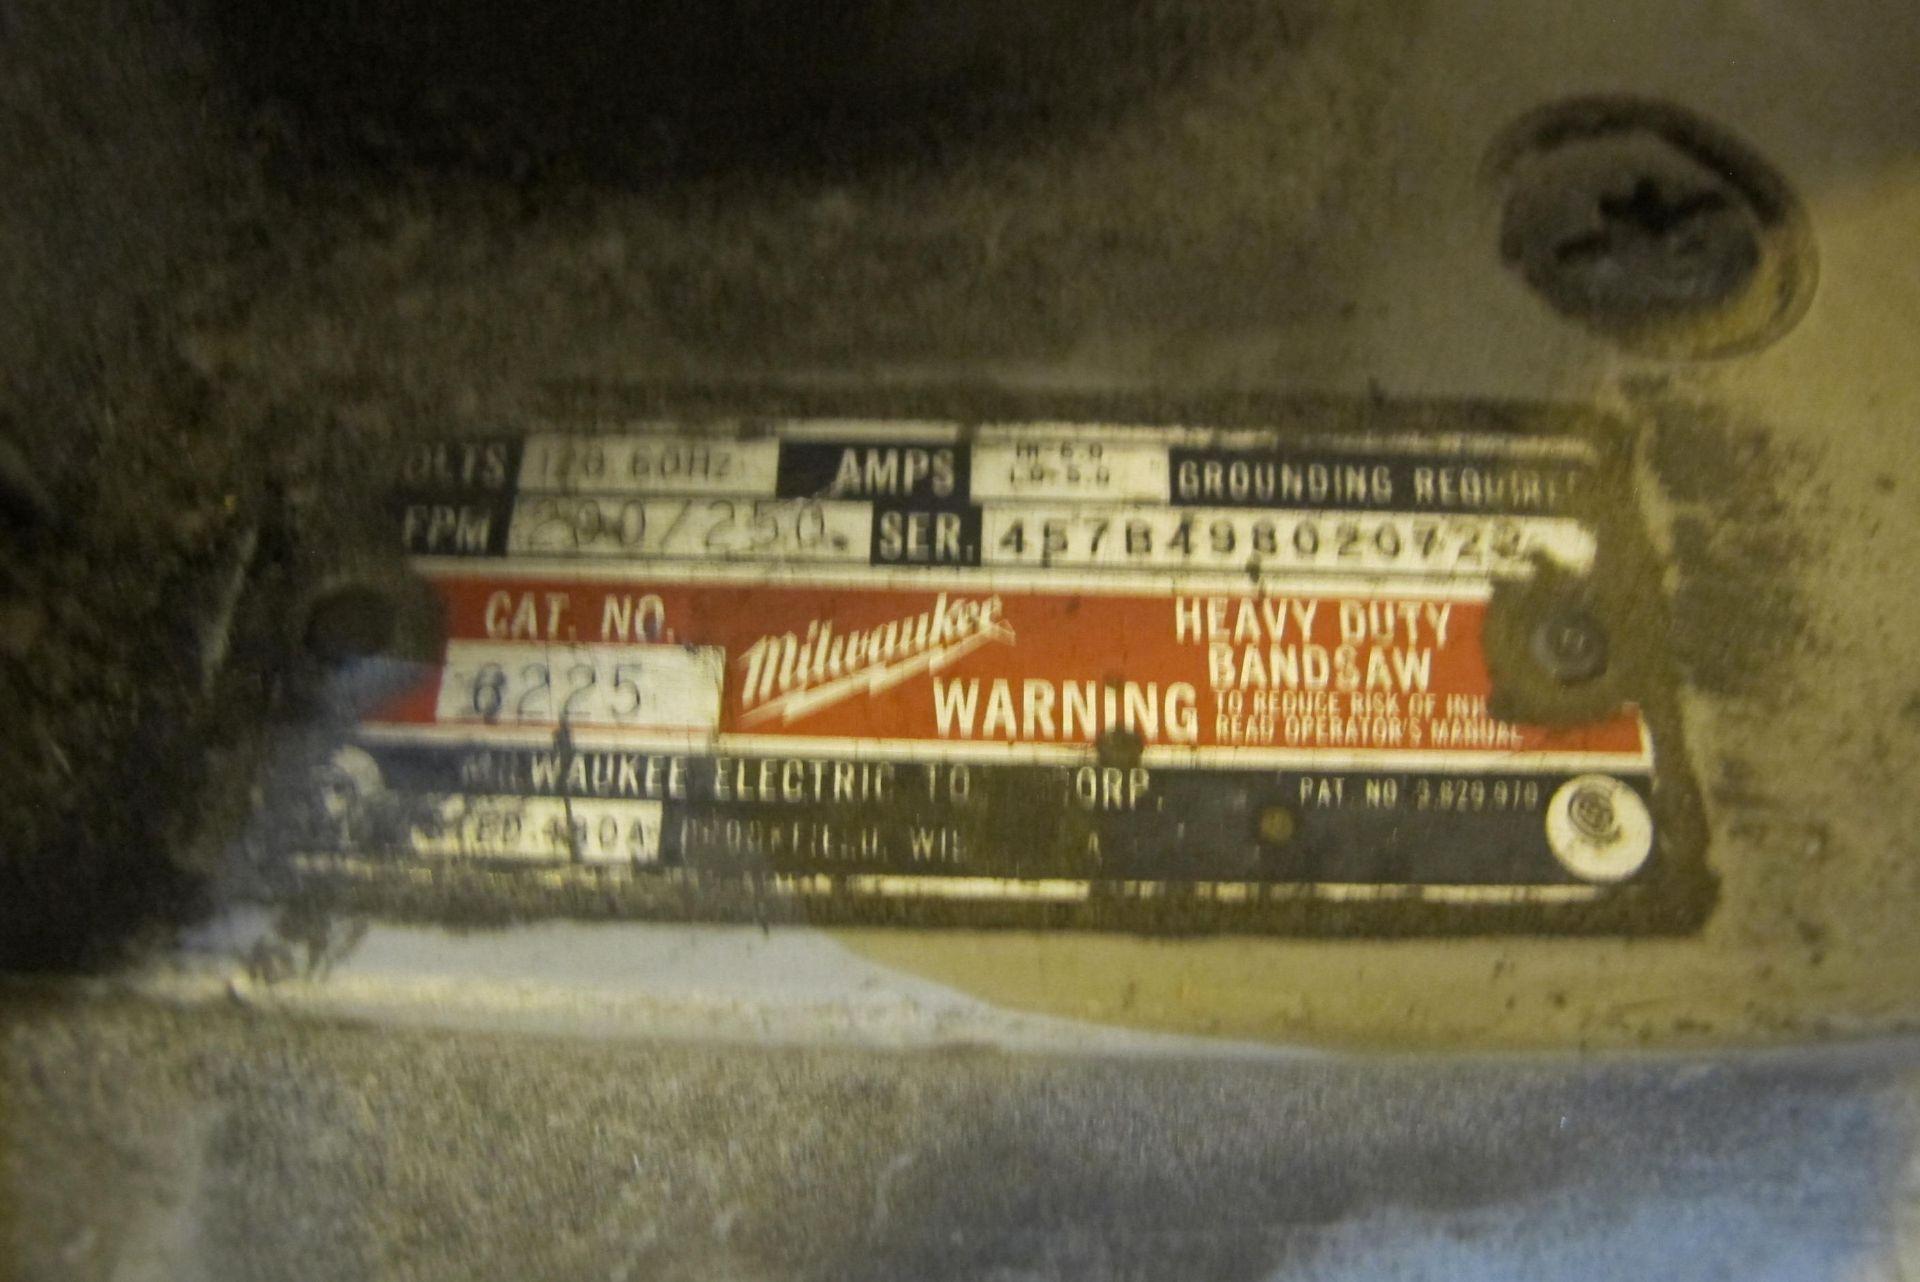 Milwaukee Cat #6225 Heavy Duty bandsaw - Image 2 of 3